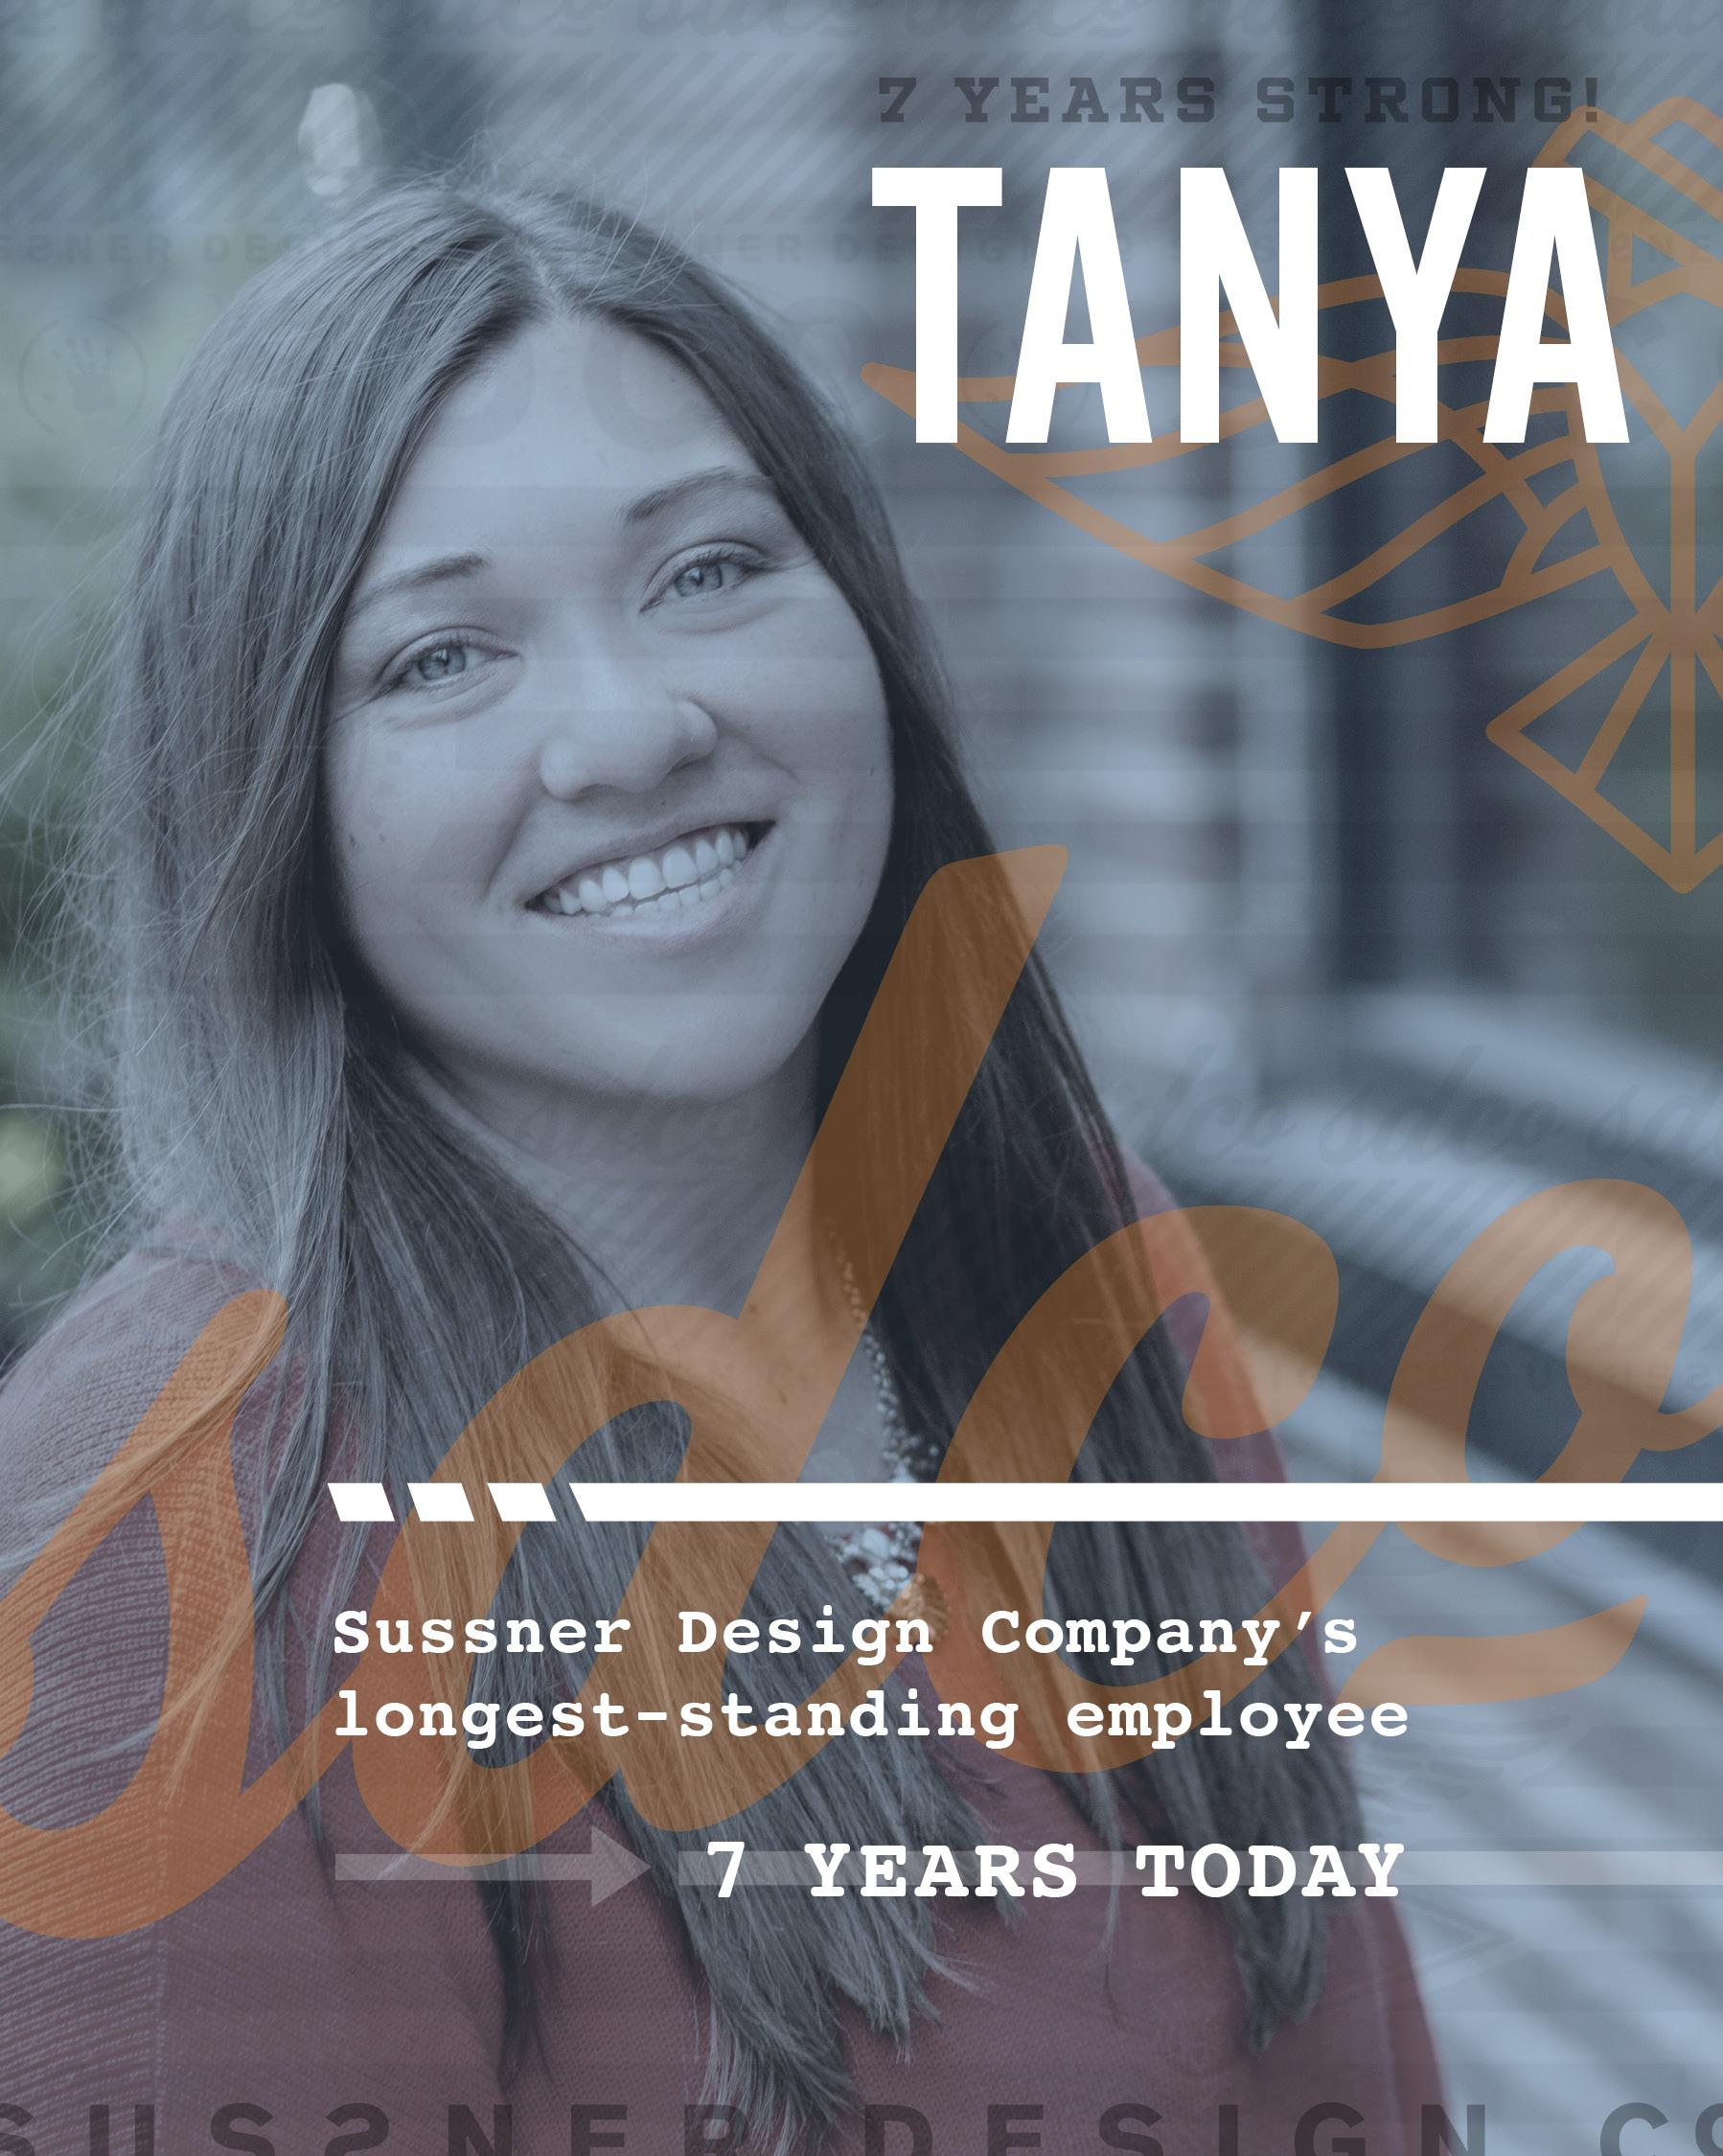 7 Years of Tanya